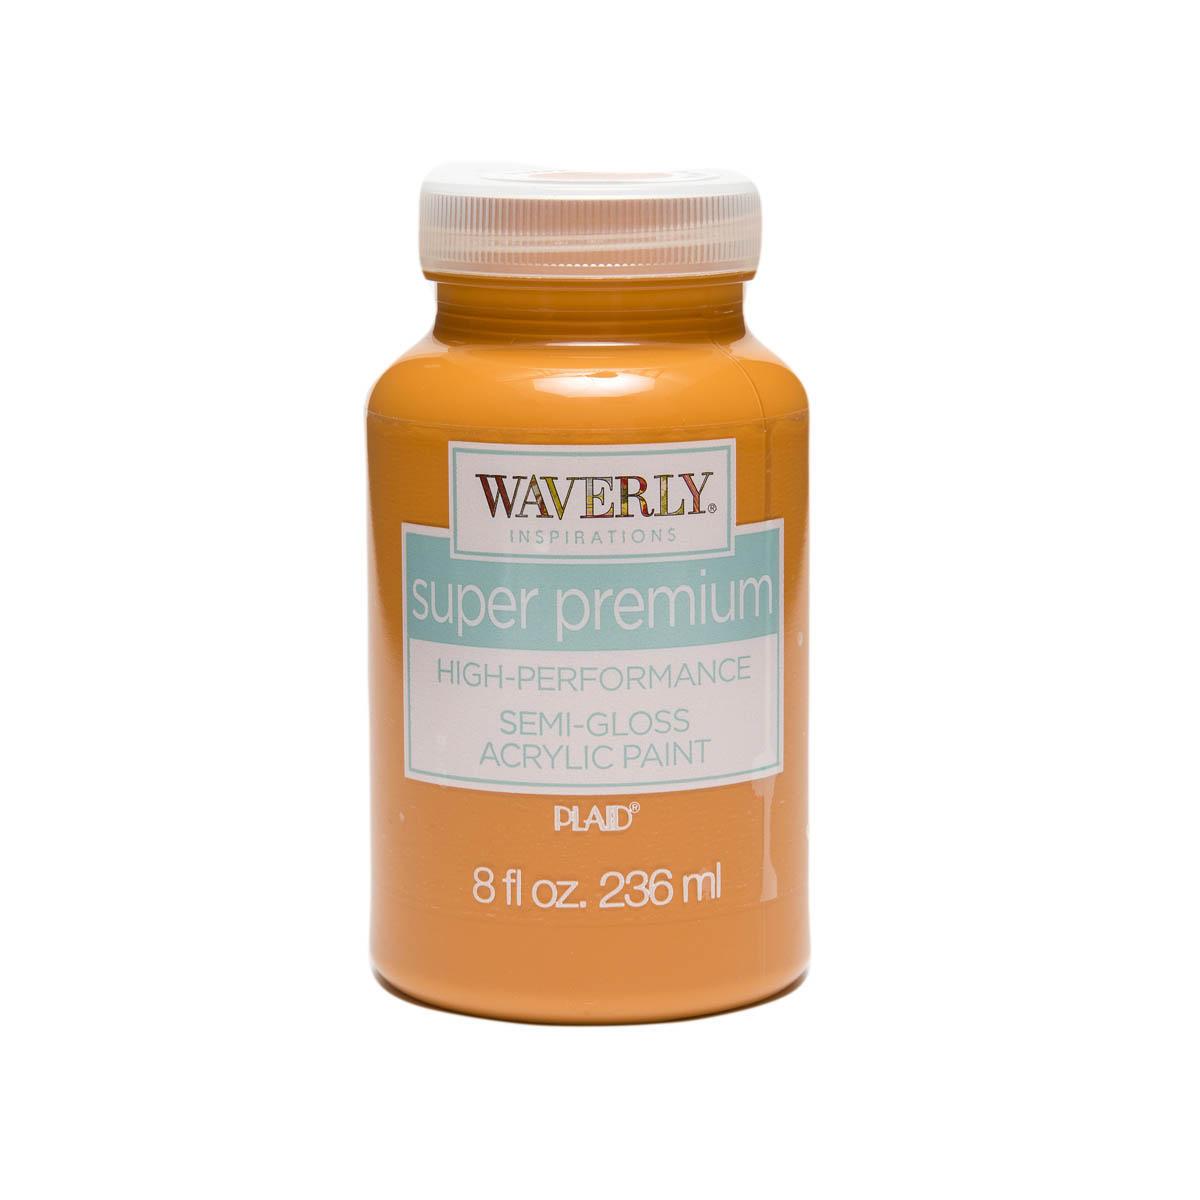 Waverly ® Inspirations Super Premium Semi-Gloss Acrylic Paint - Pumpkin, 8 oz.